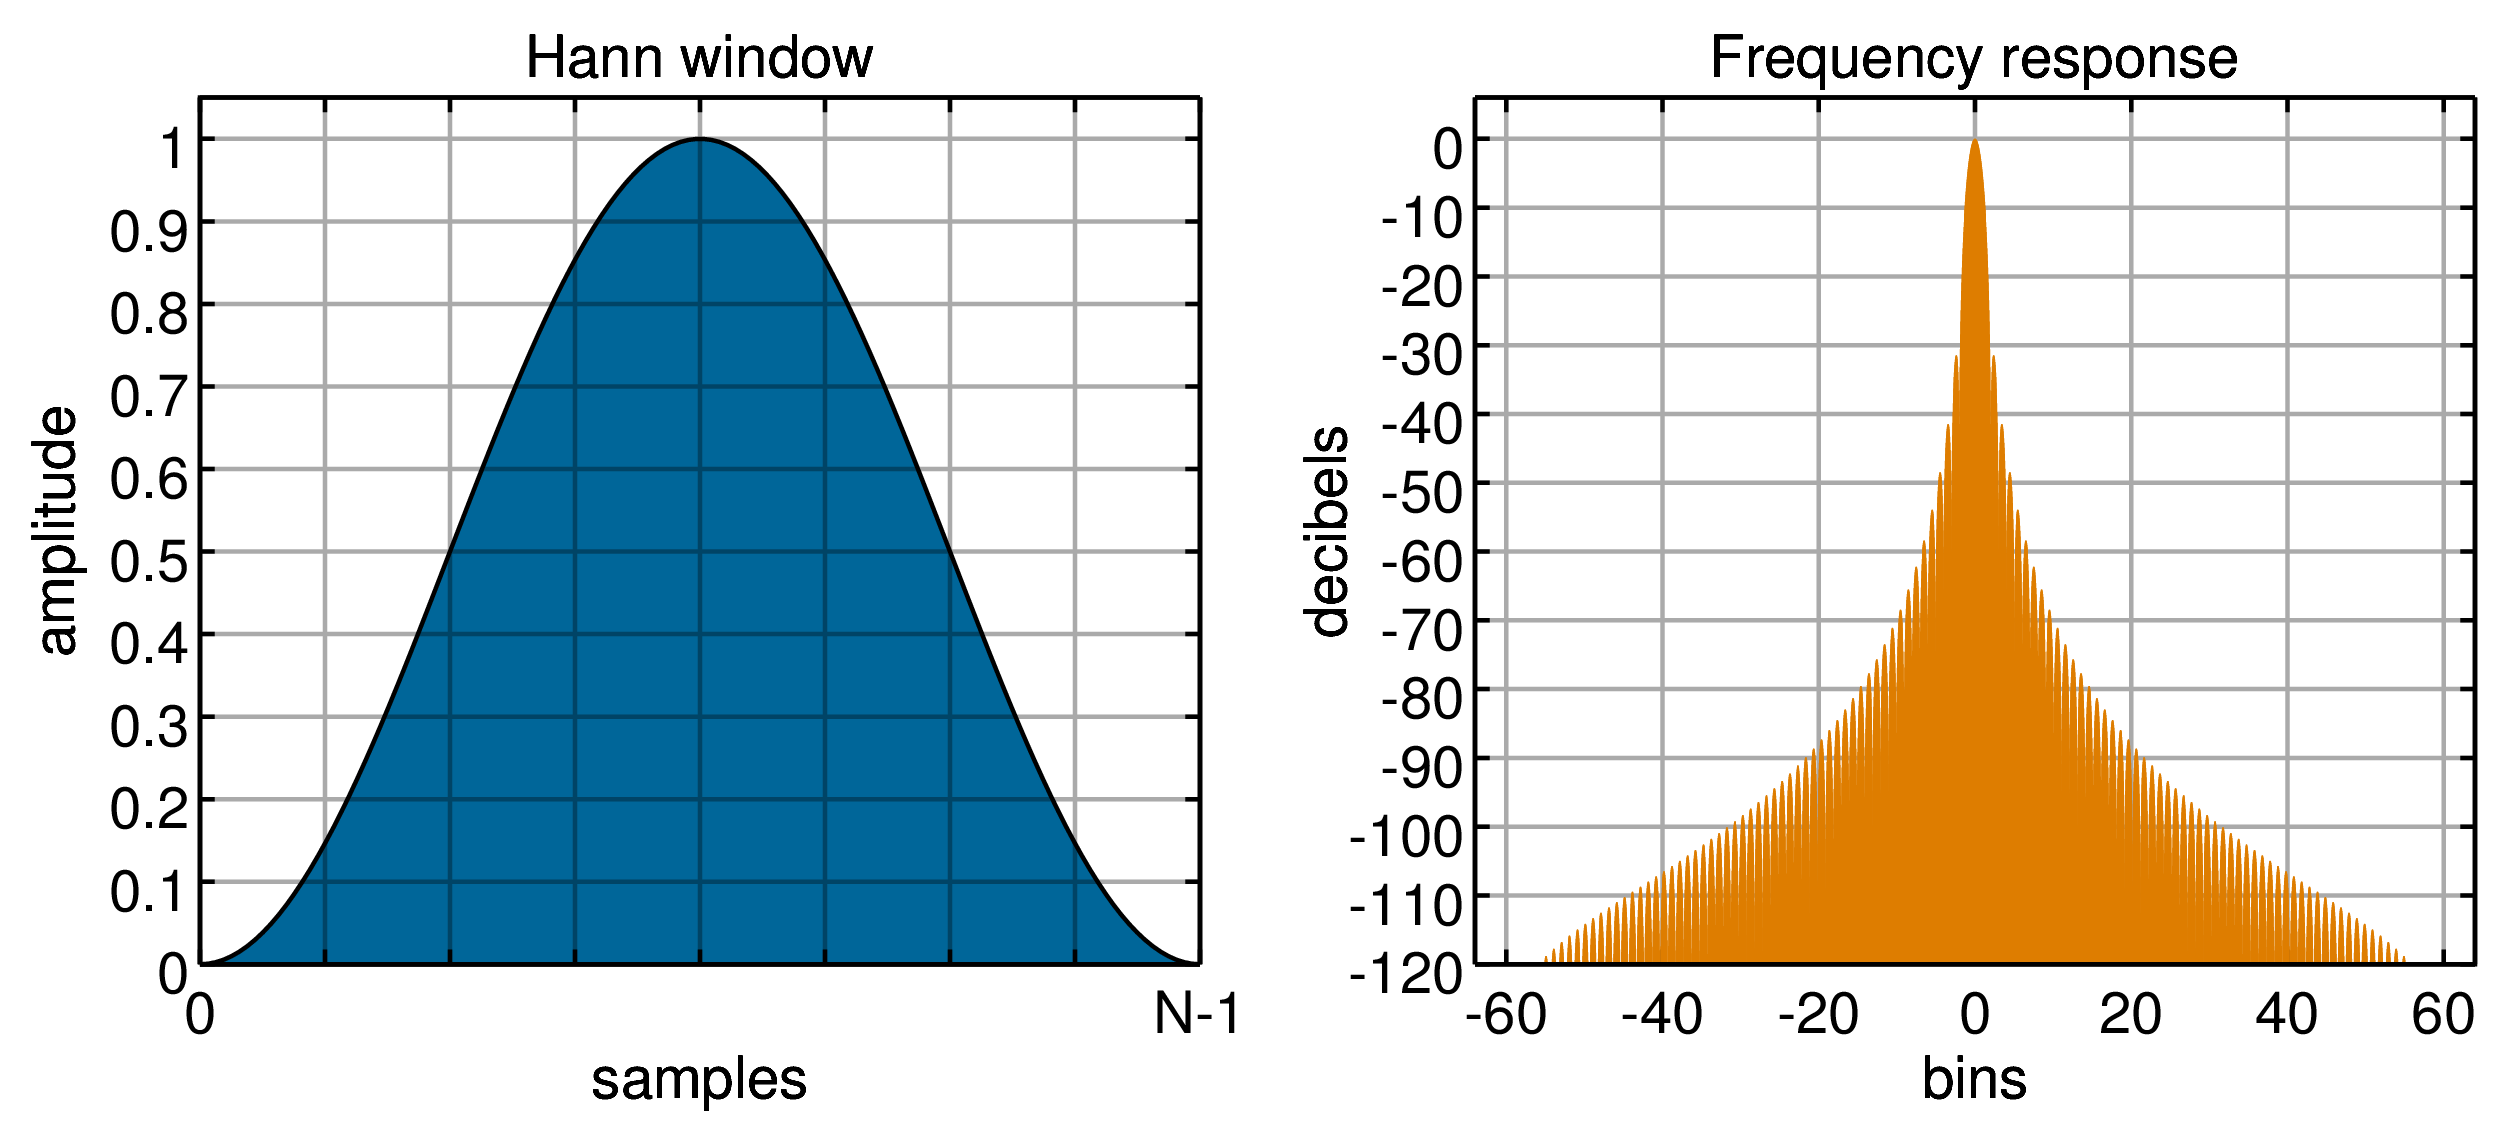 http://upload.wikimedia.org/wikipedia/commons/f/ff/Window_function_%28hann%29.png